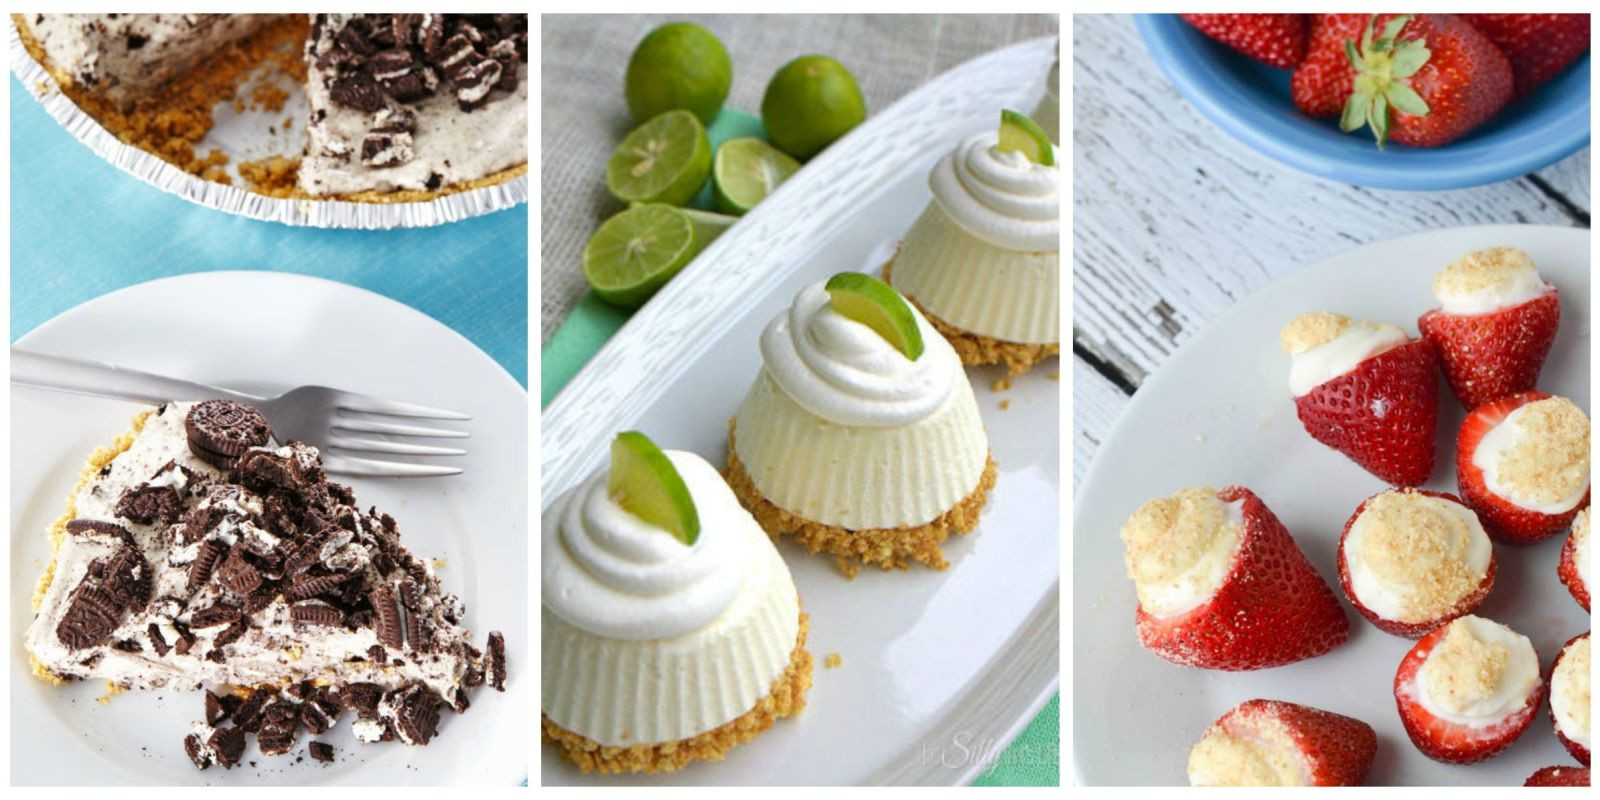 Summer Desserts Easy  57 Easy Summer Desserts Best Recipes for Frozen Summer